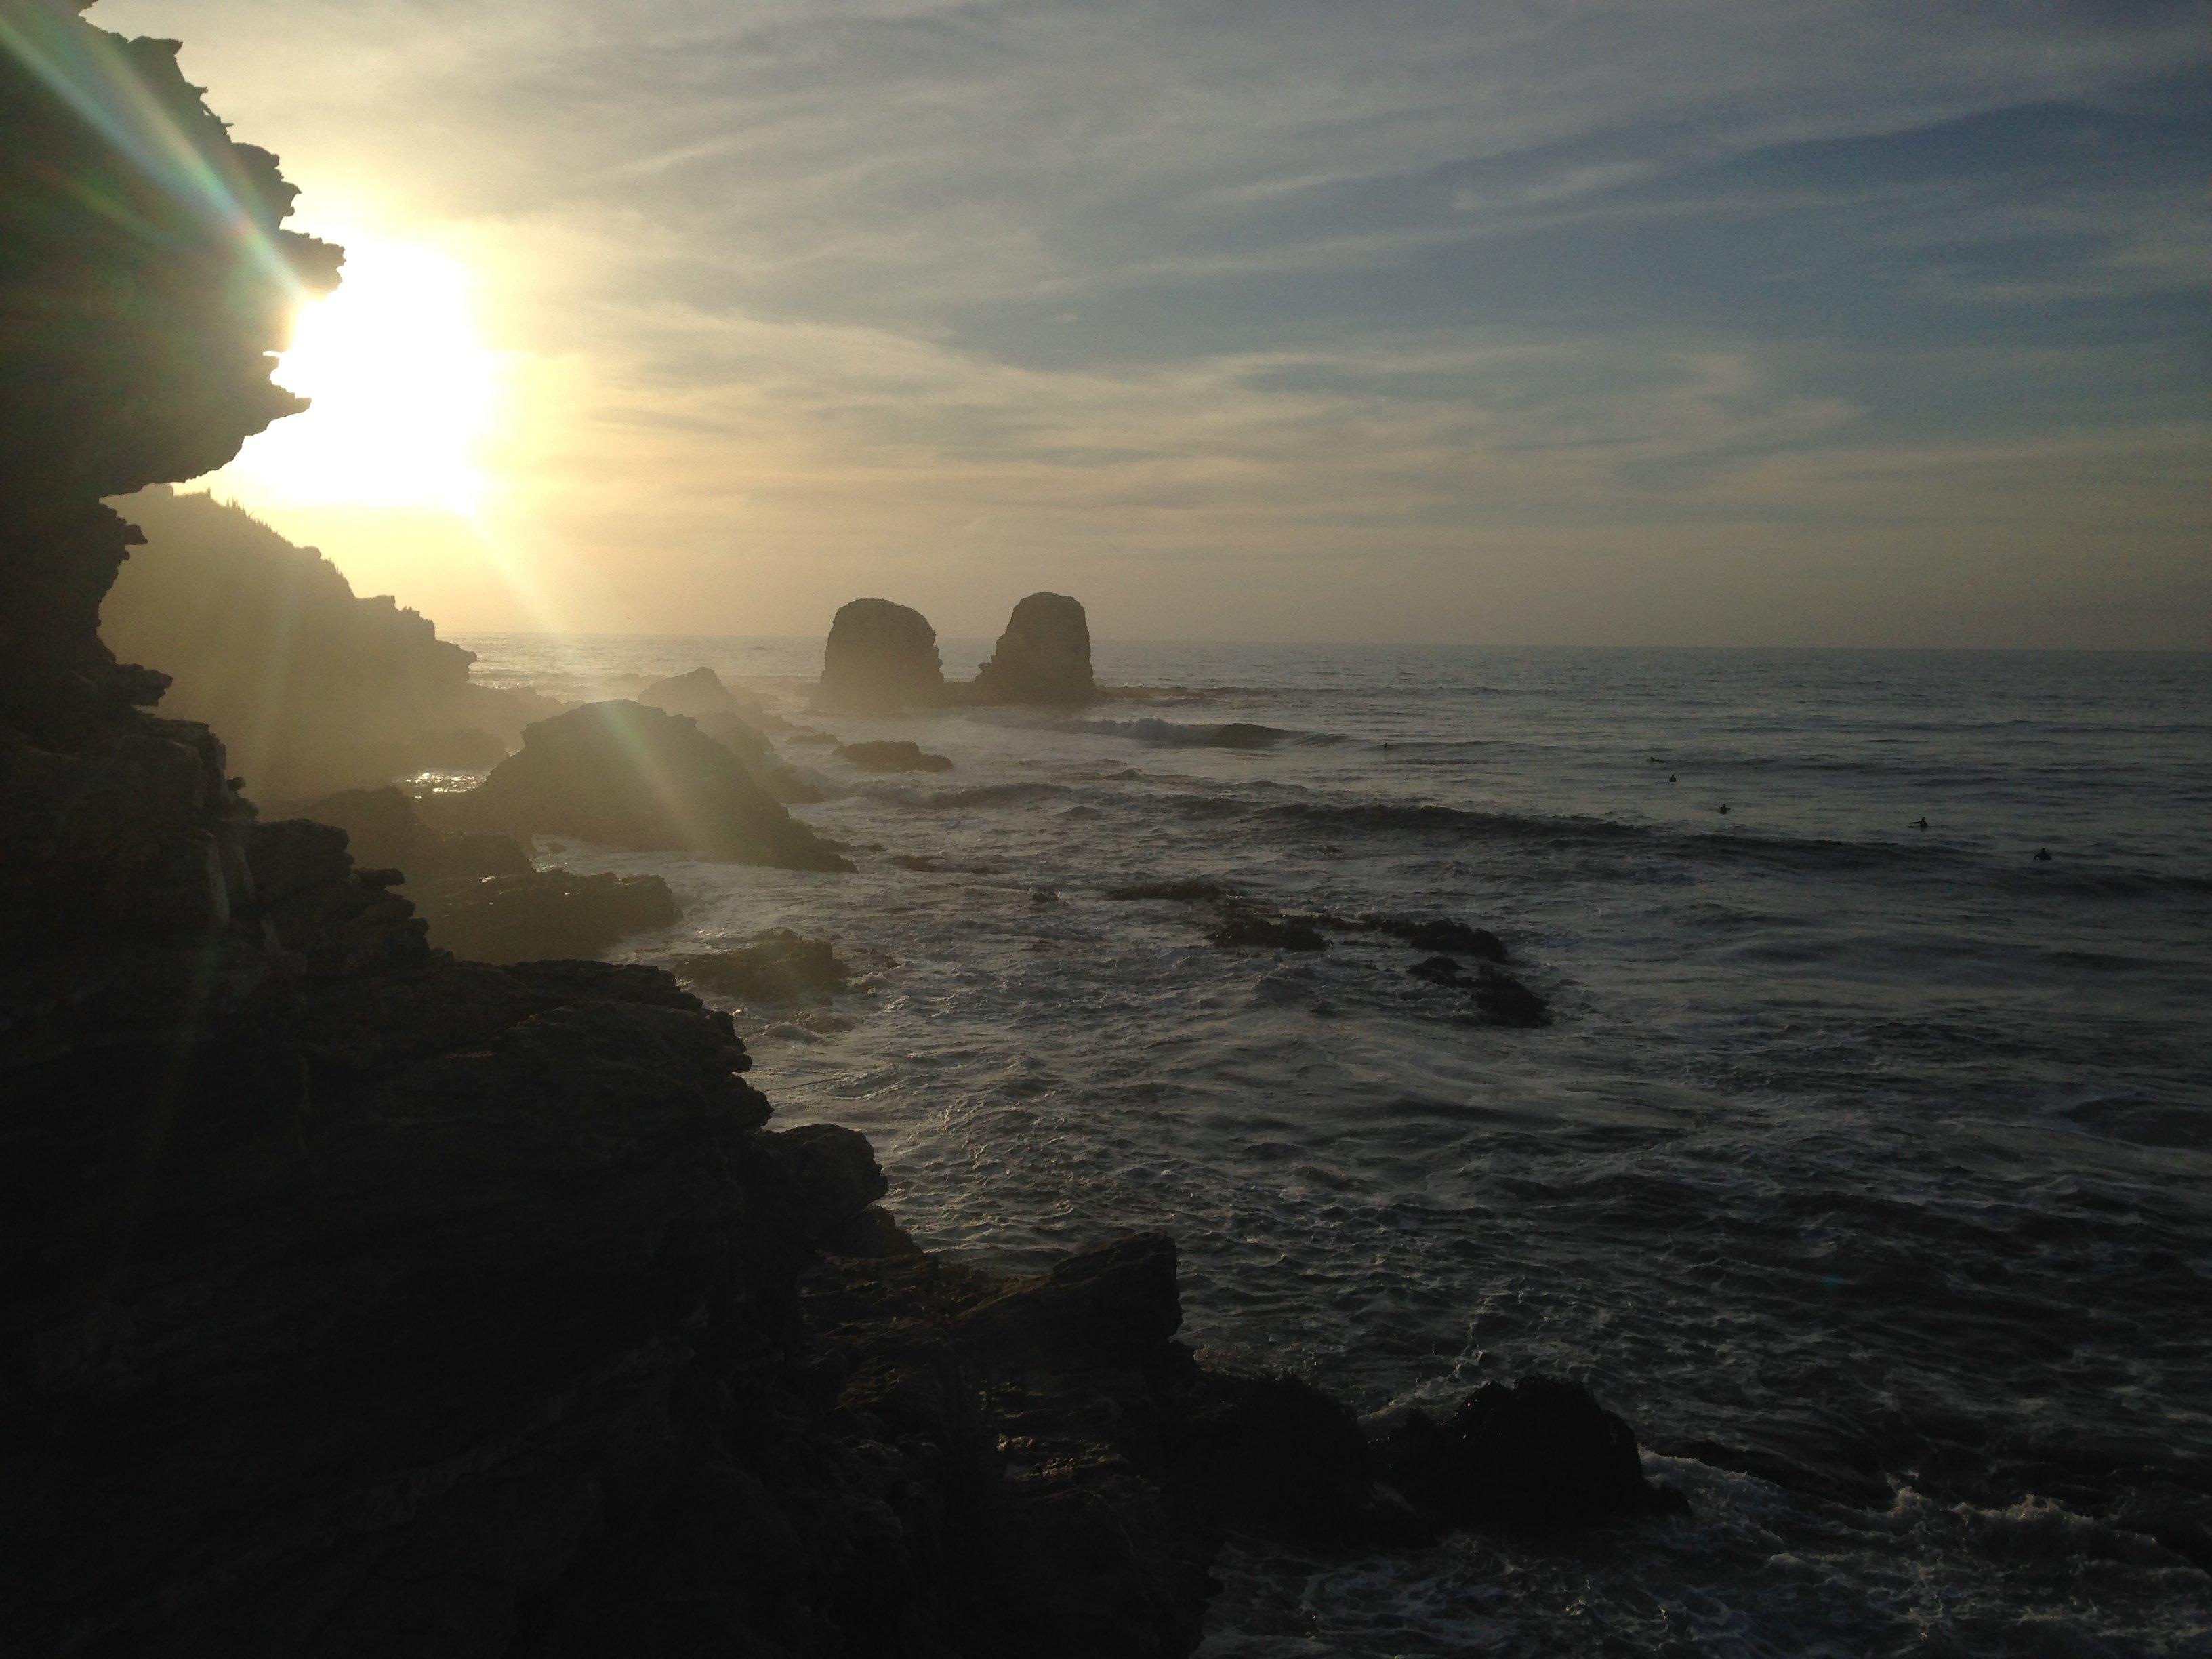 Lobos_Sunset_Nik_Strong-Cvetich